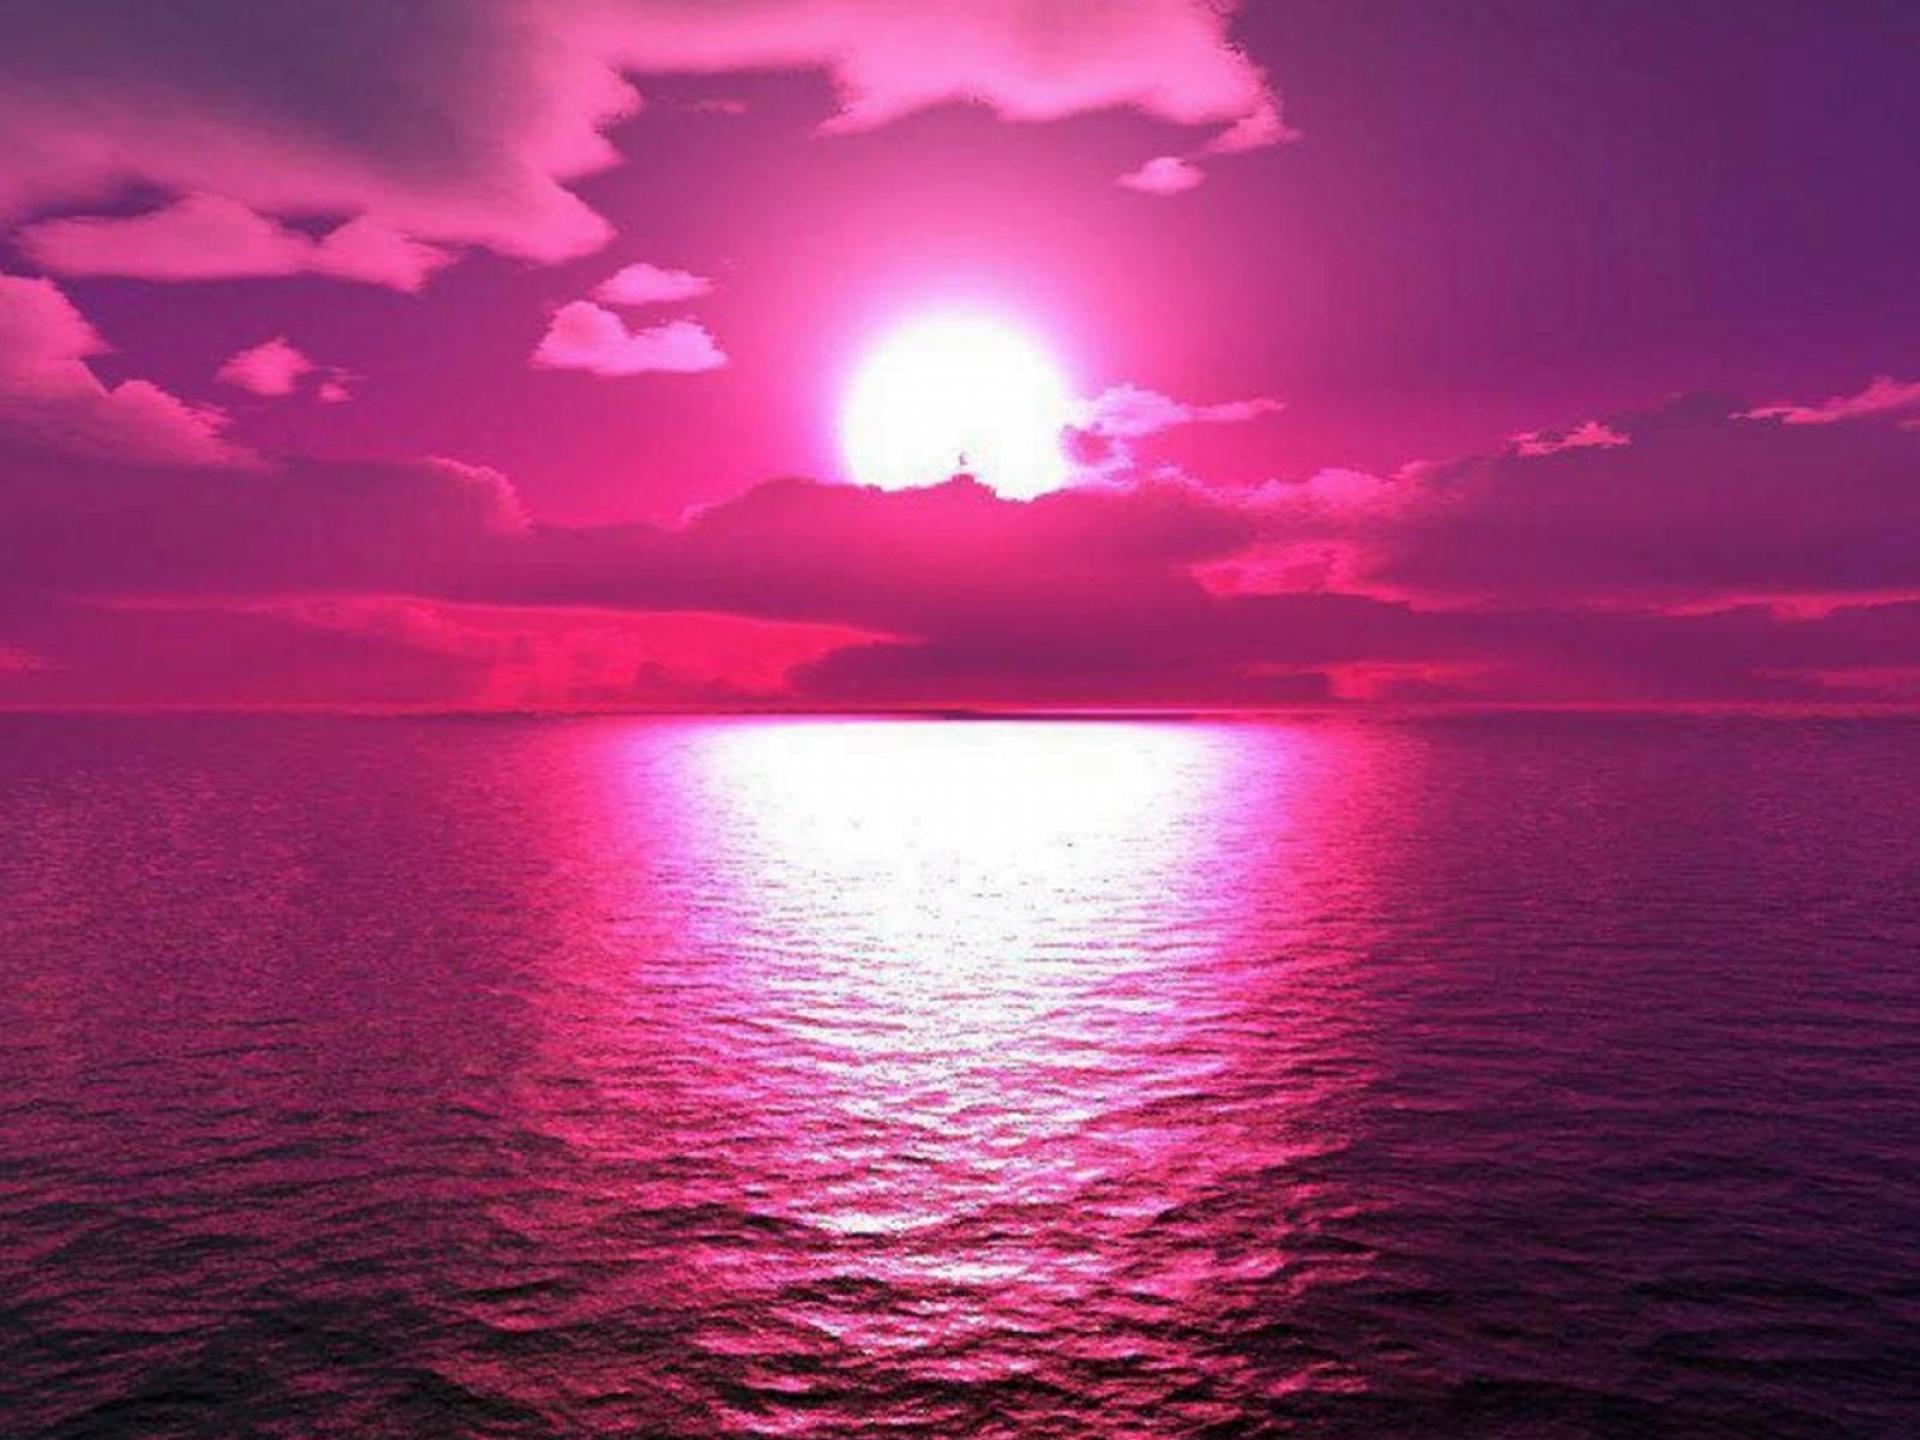 Hot Pink Desktop Wallpaper wwwgalleryhipcom   The 1920x1440